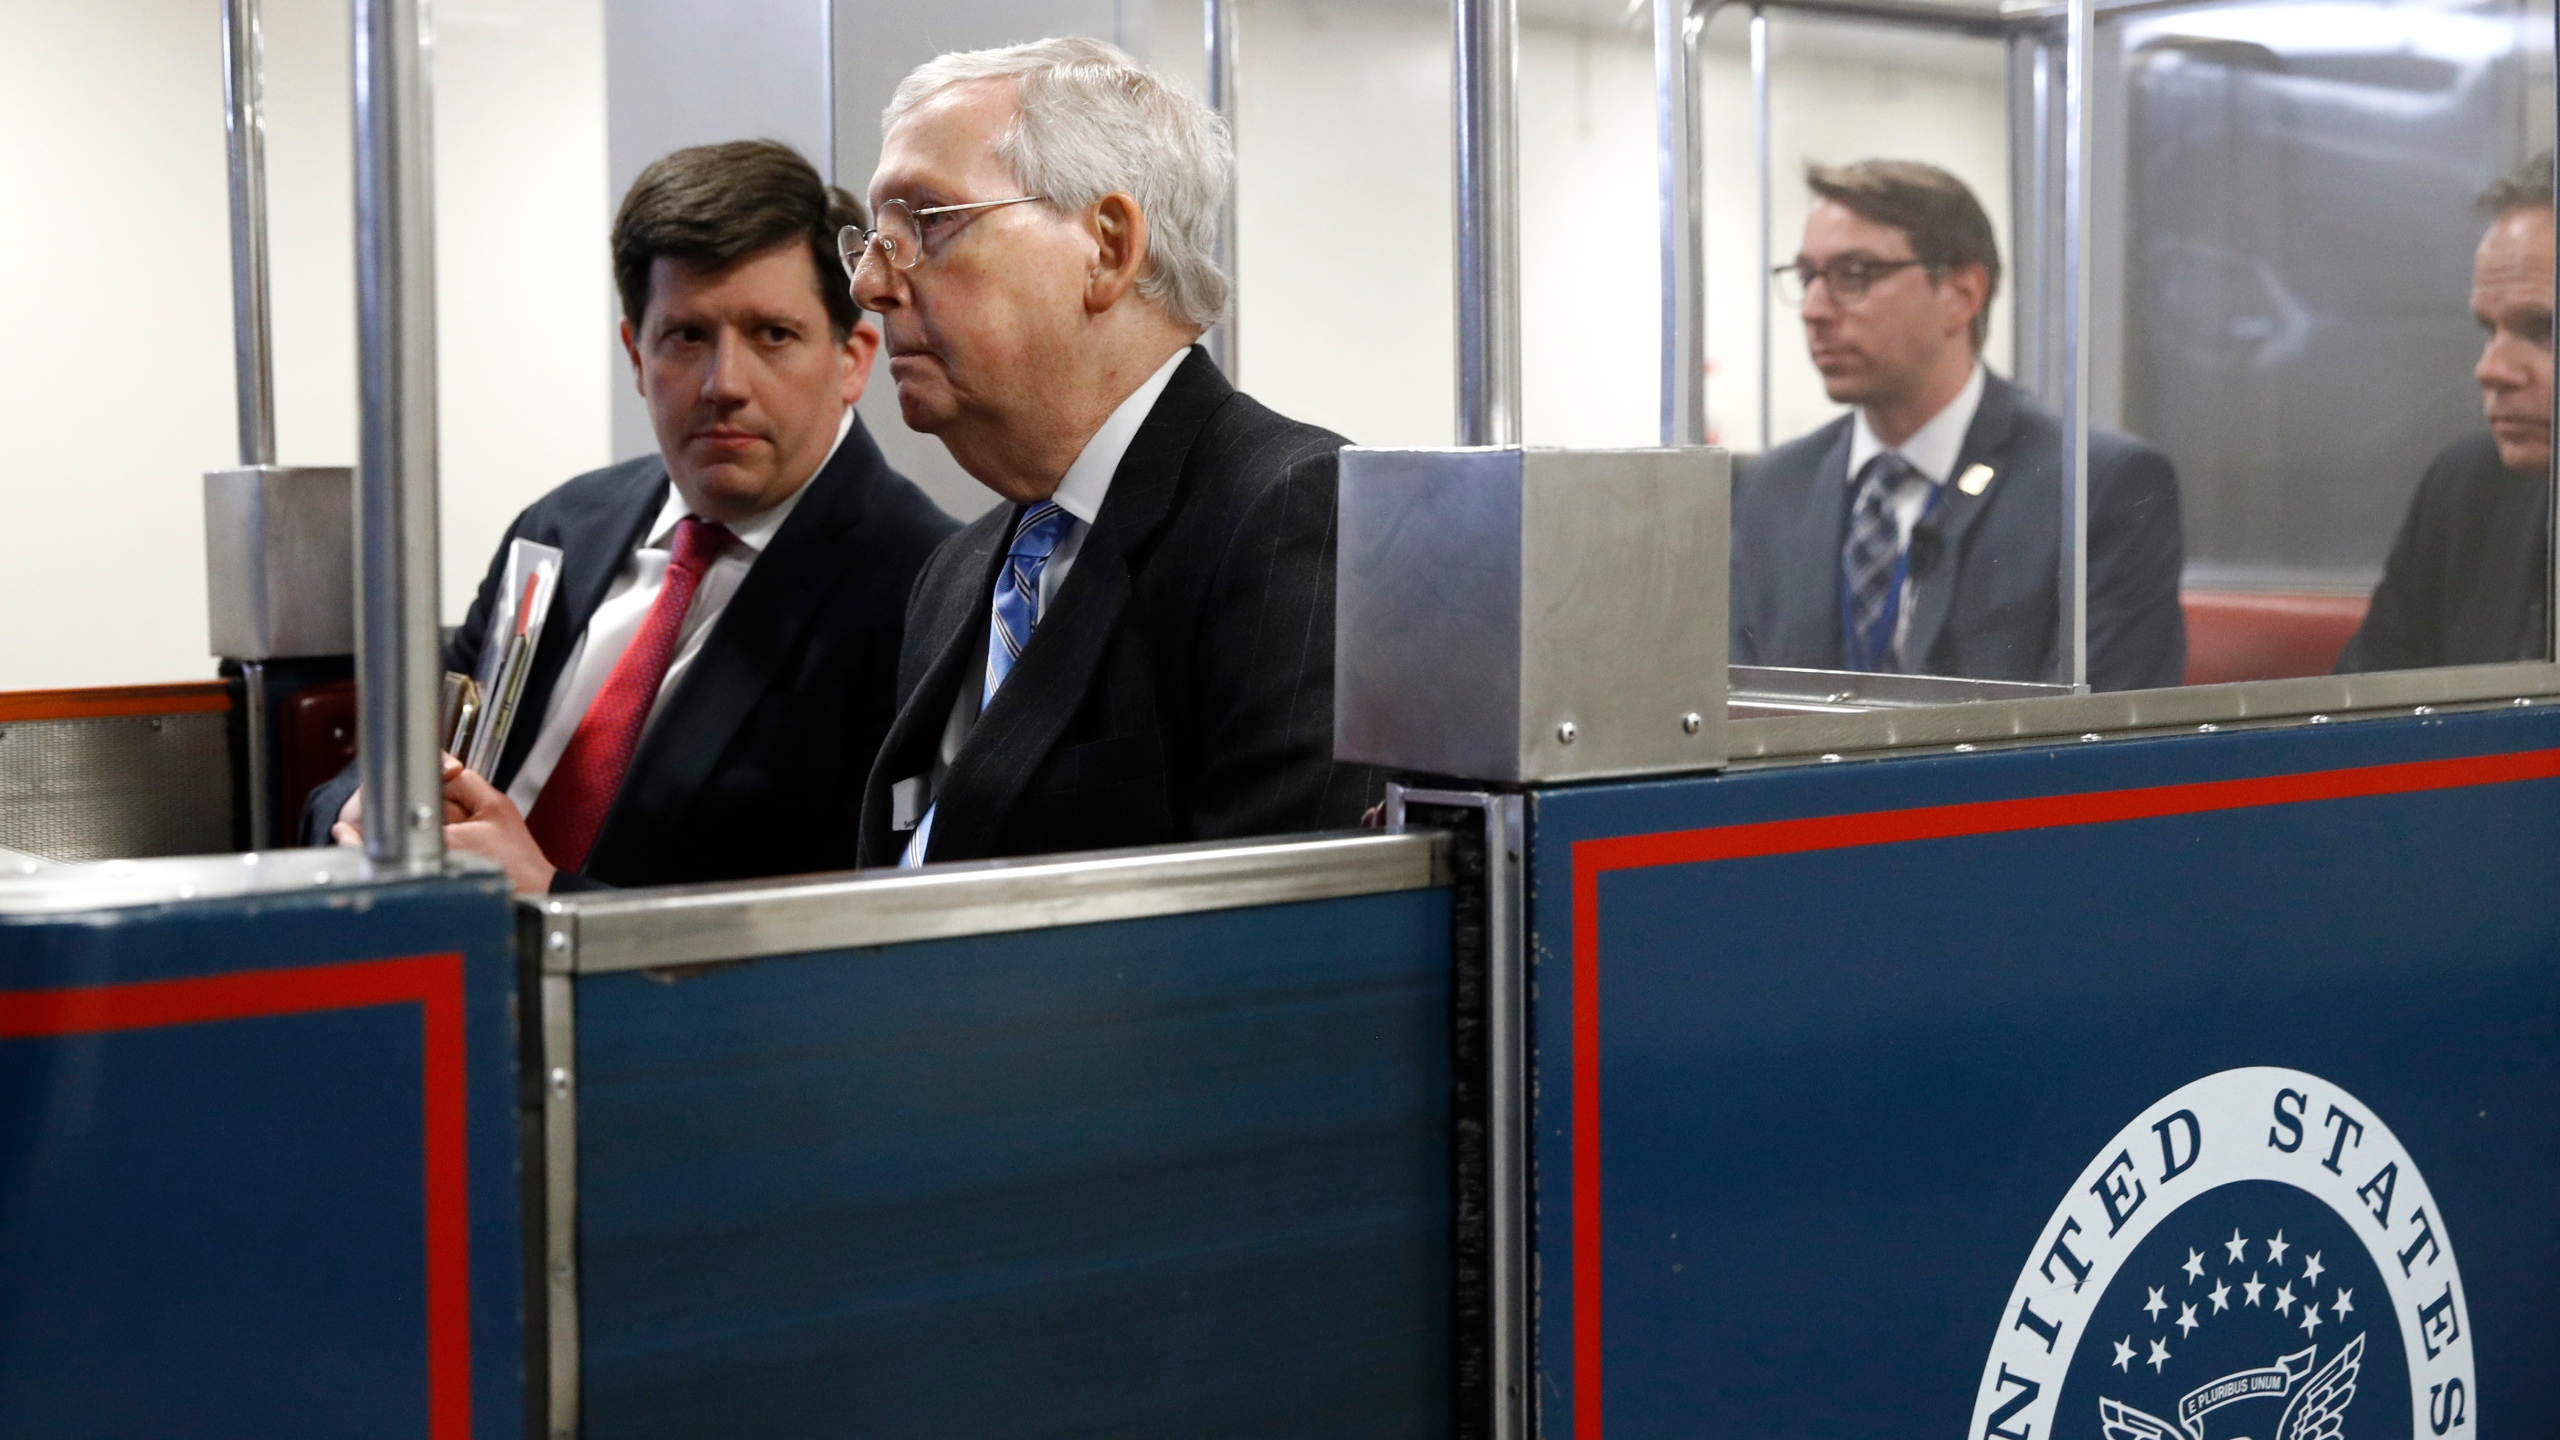 Senate Majority Leader Mitch McConnell rides a subway car on Capitol Hill in Washington before a vote on a coronavirus response bill. (AP file/Patrick Semansky)